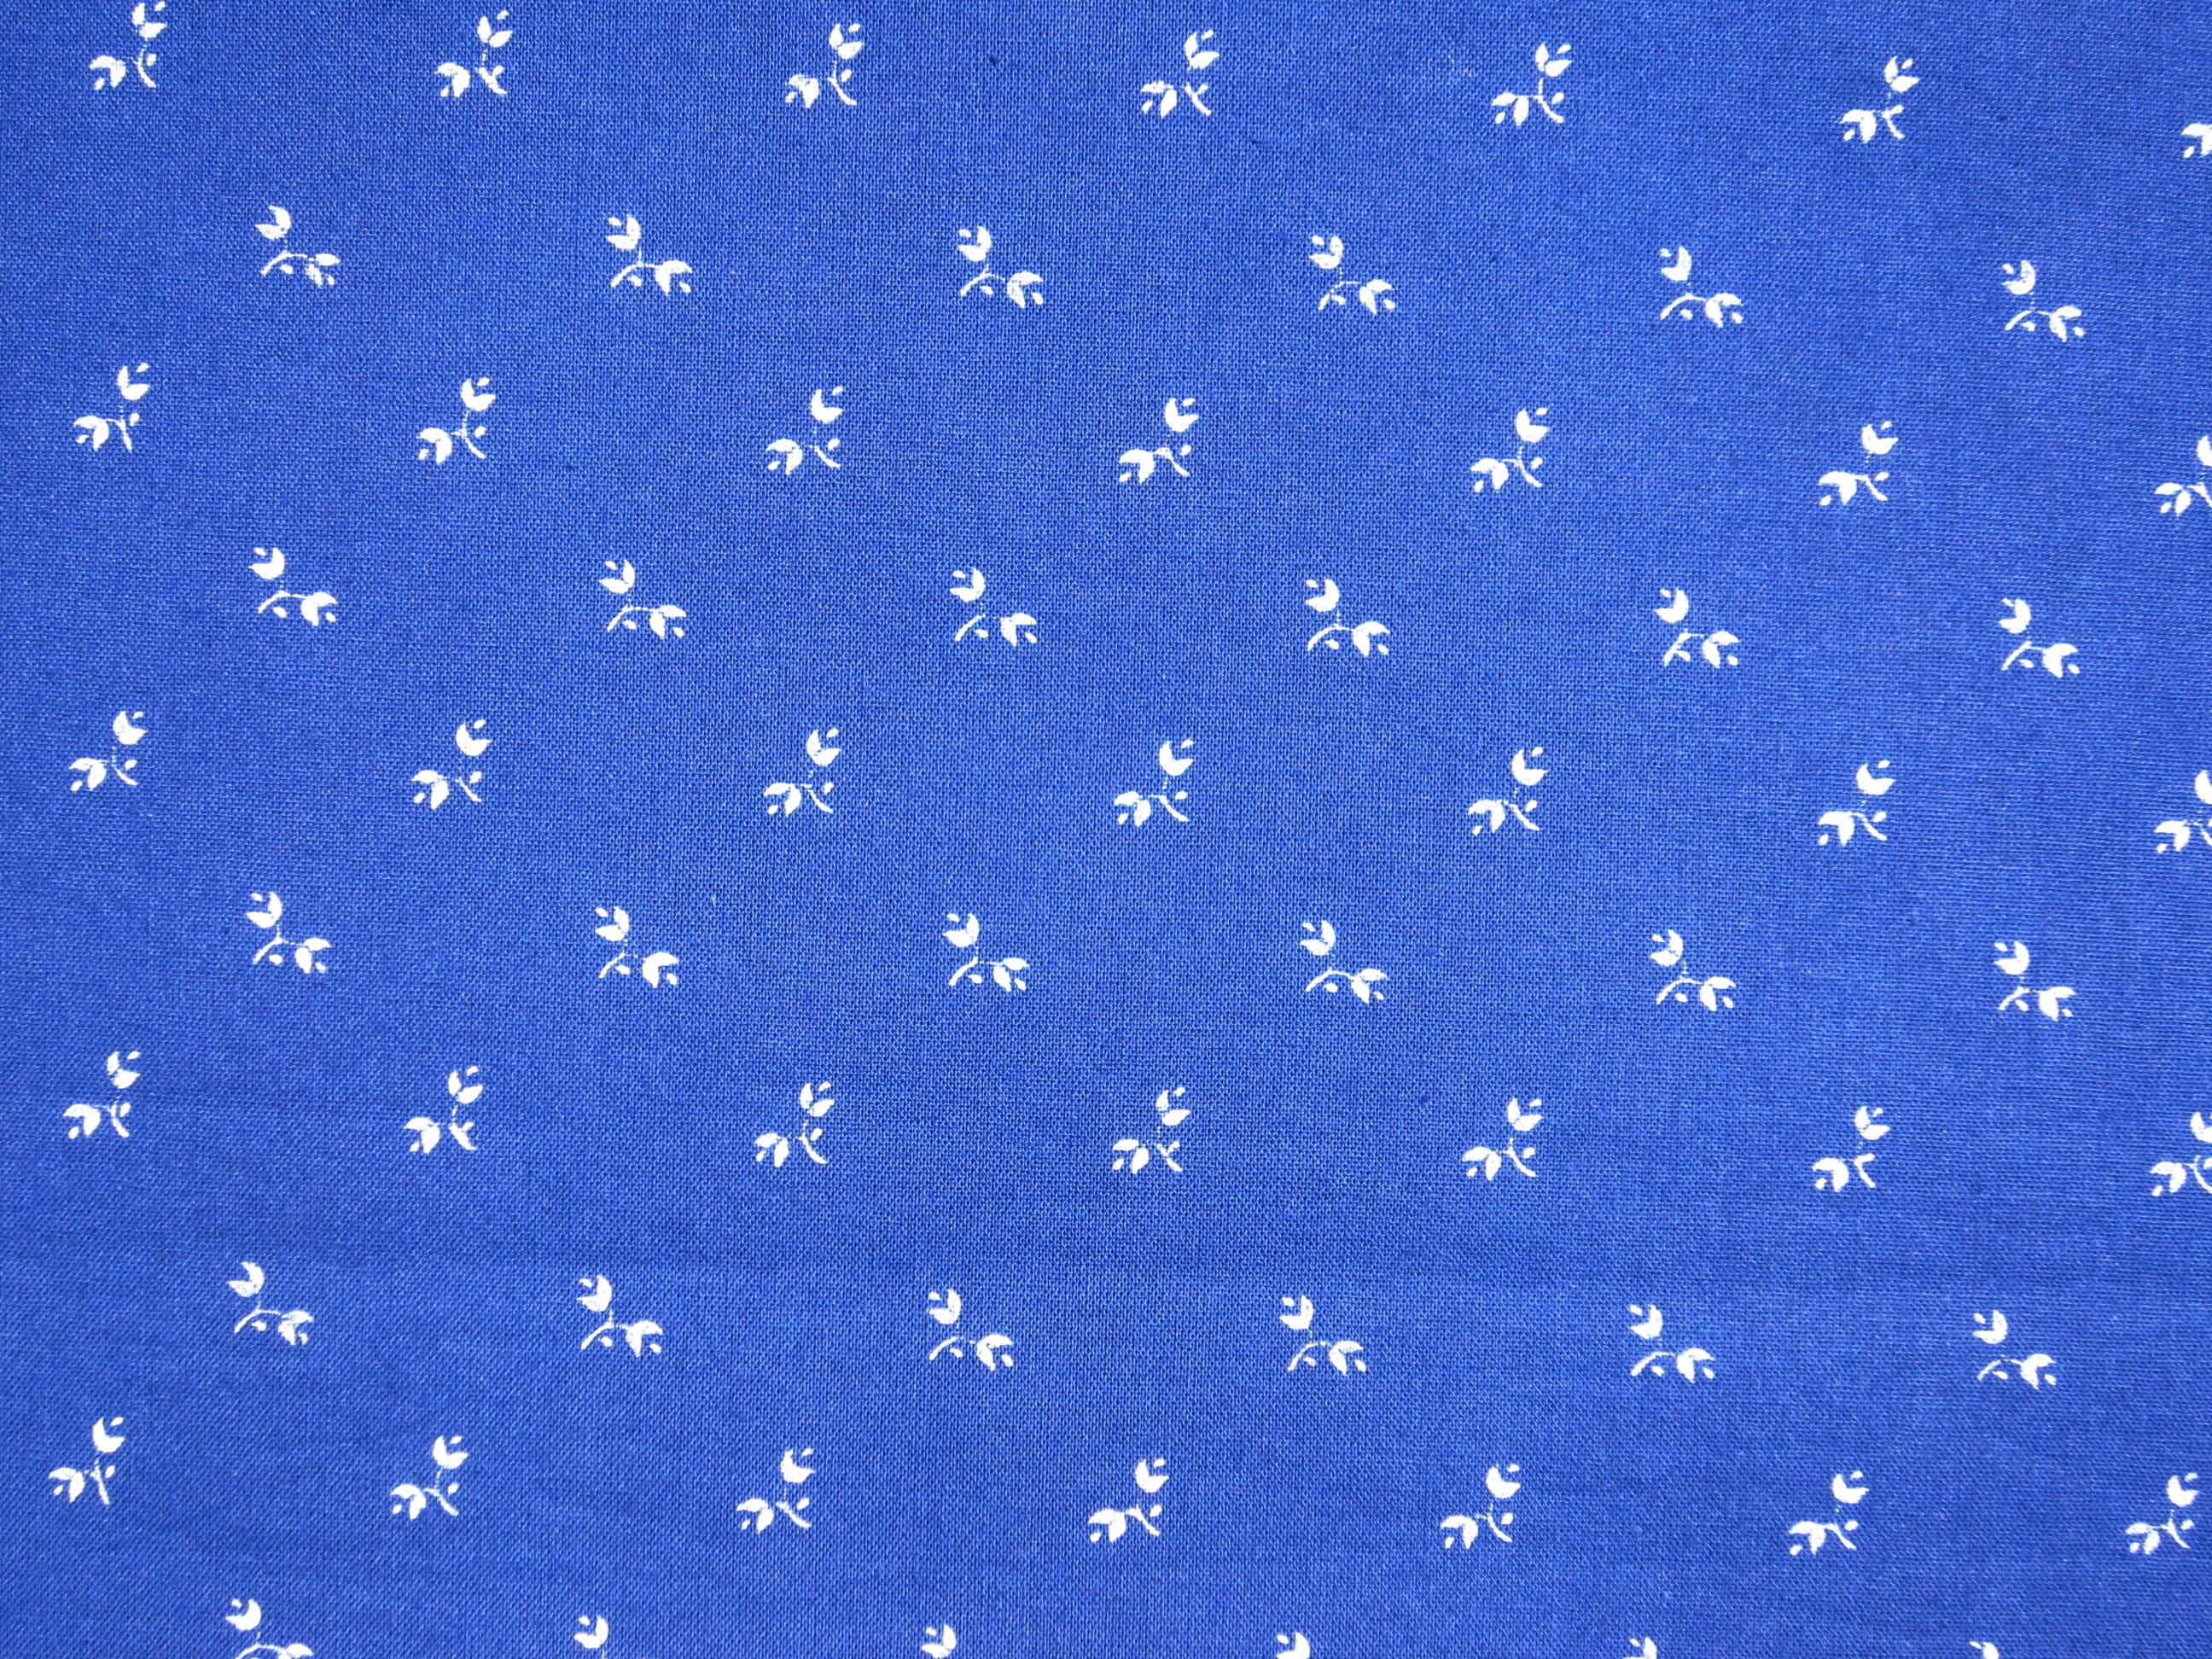 Blaudruckstoff 047 - Stoffbreite nur 70cm-0